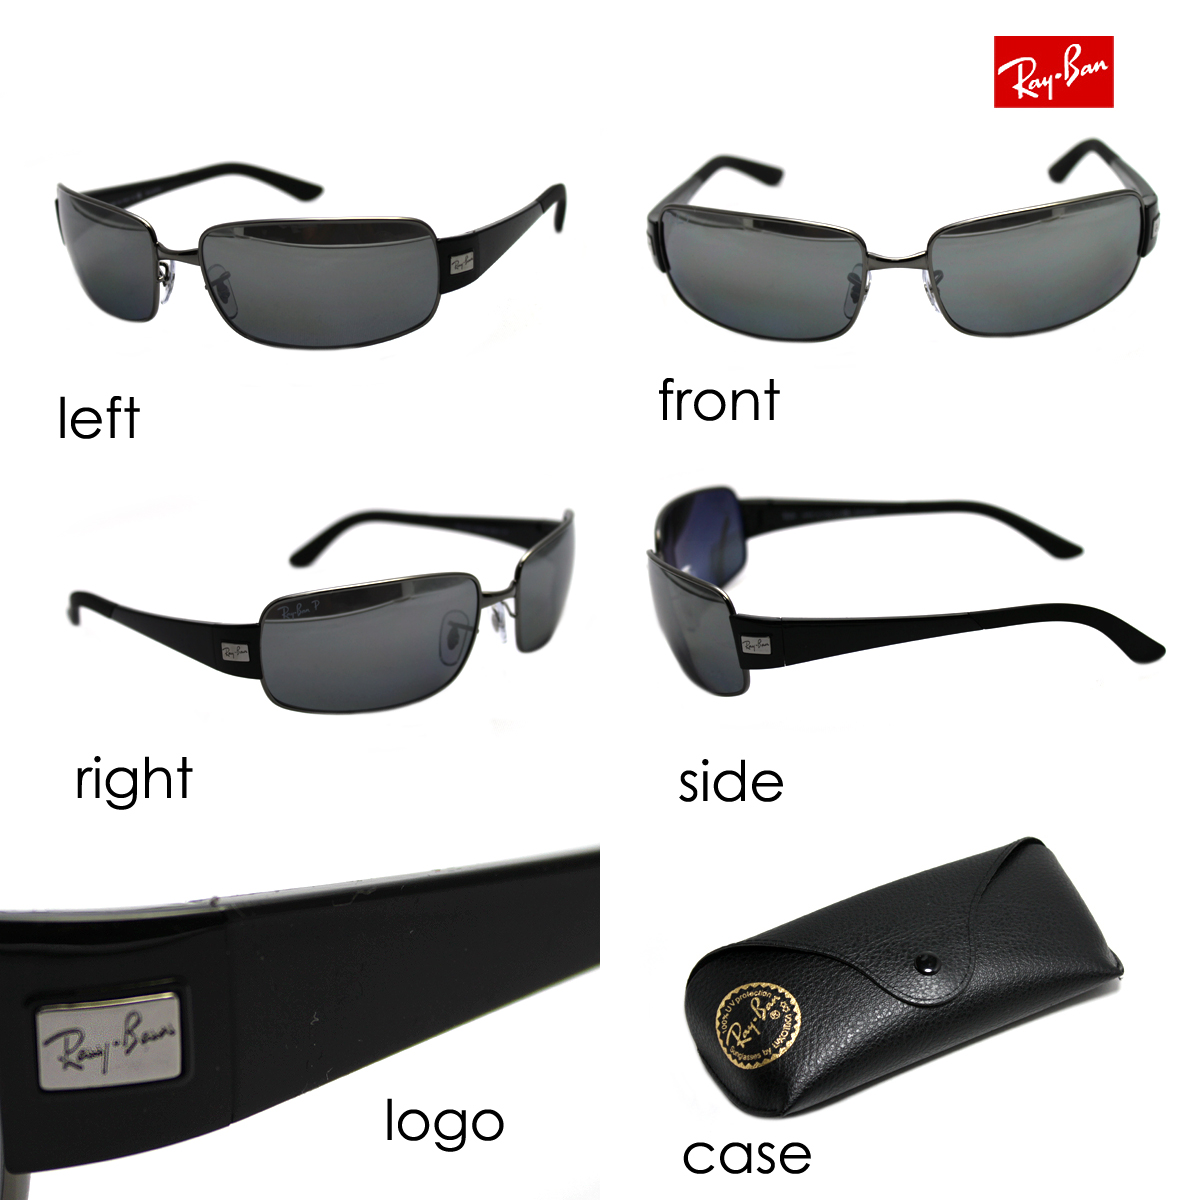 RB3421 00482 RayBan Ray Ban sunglasses polarized NEW ARRIVAL glassmania